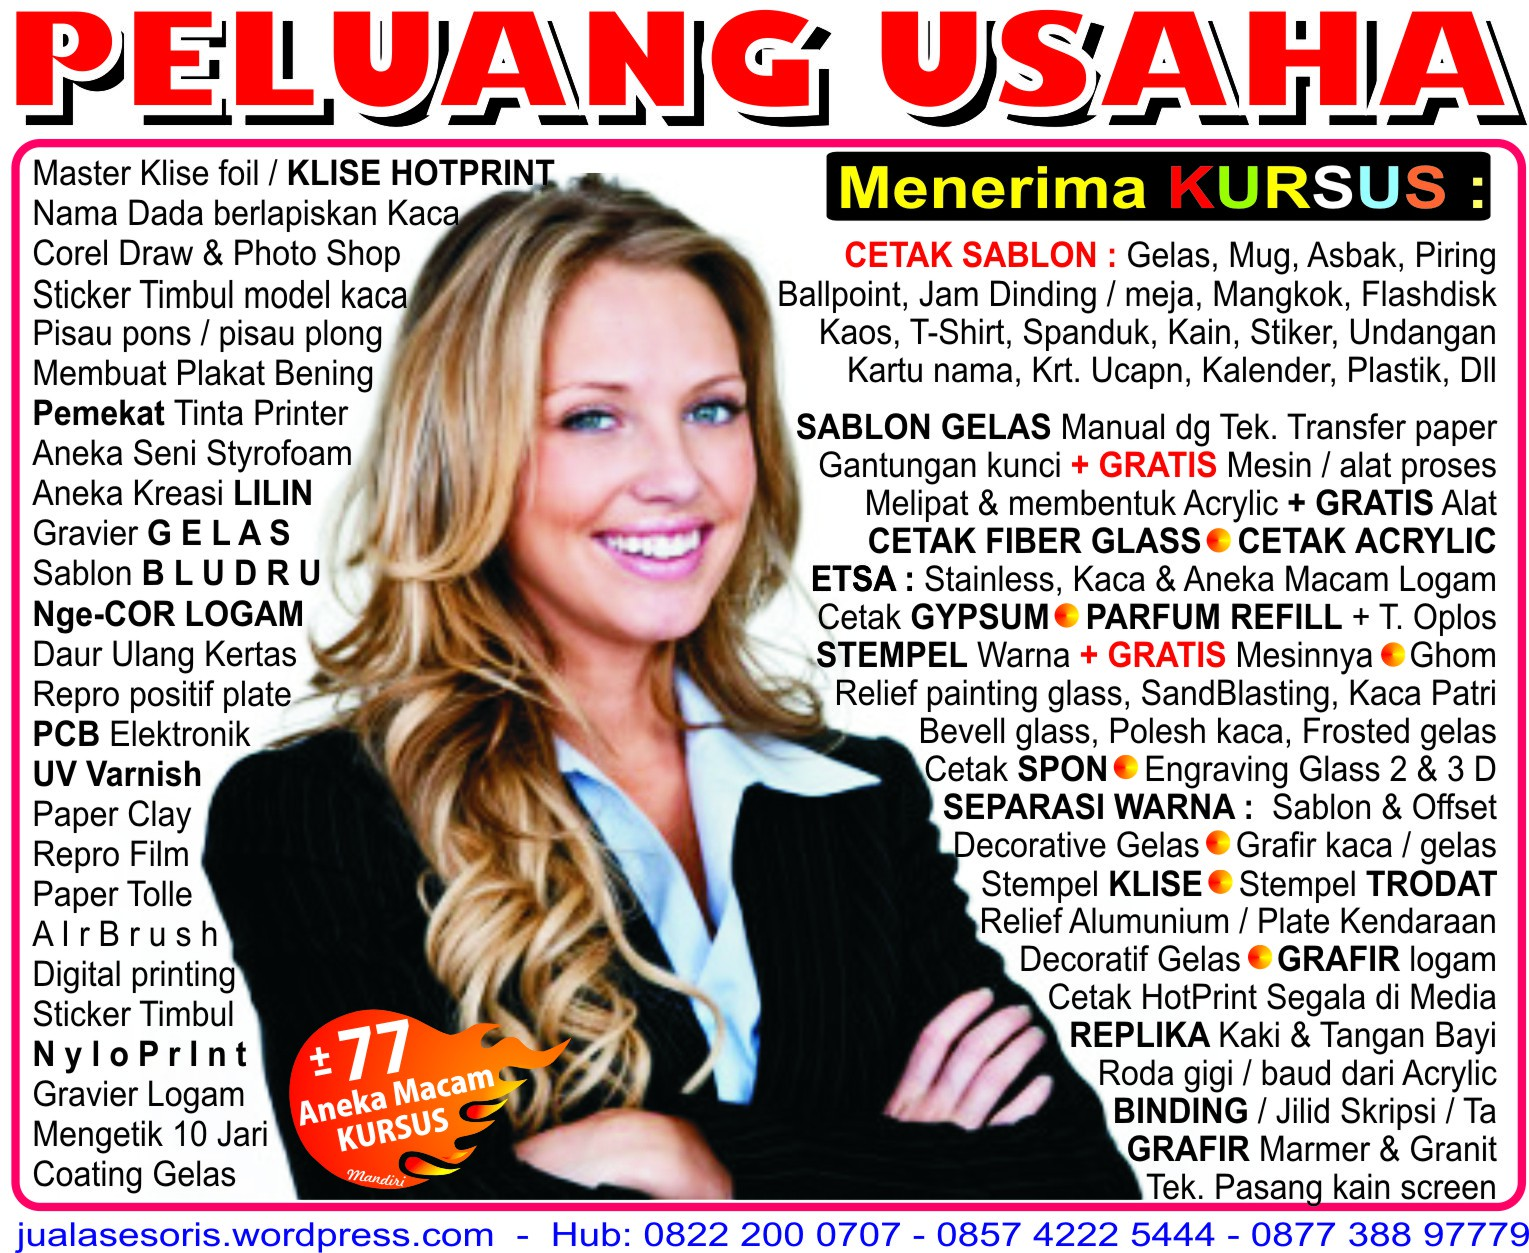 Lowongan Guru Agama Di Cikarang Lowongan Kerja Pt Sanwa Screen Indonesia Lowongan Kerja Kursus Acrylic Gratis Mesin Alat Melipat And Membentuk Acrylic Http